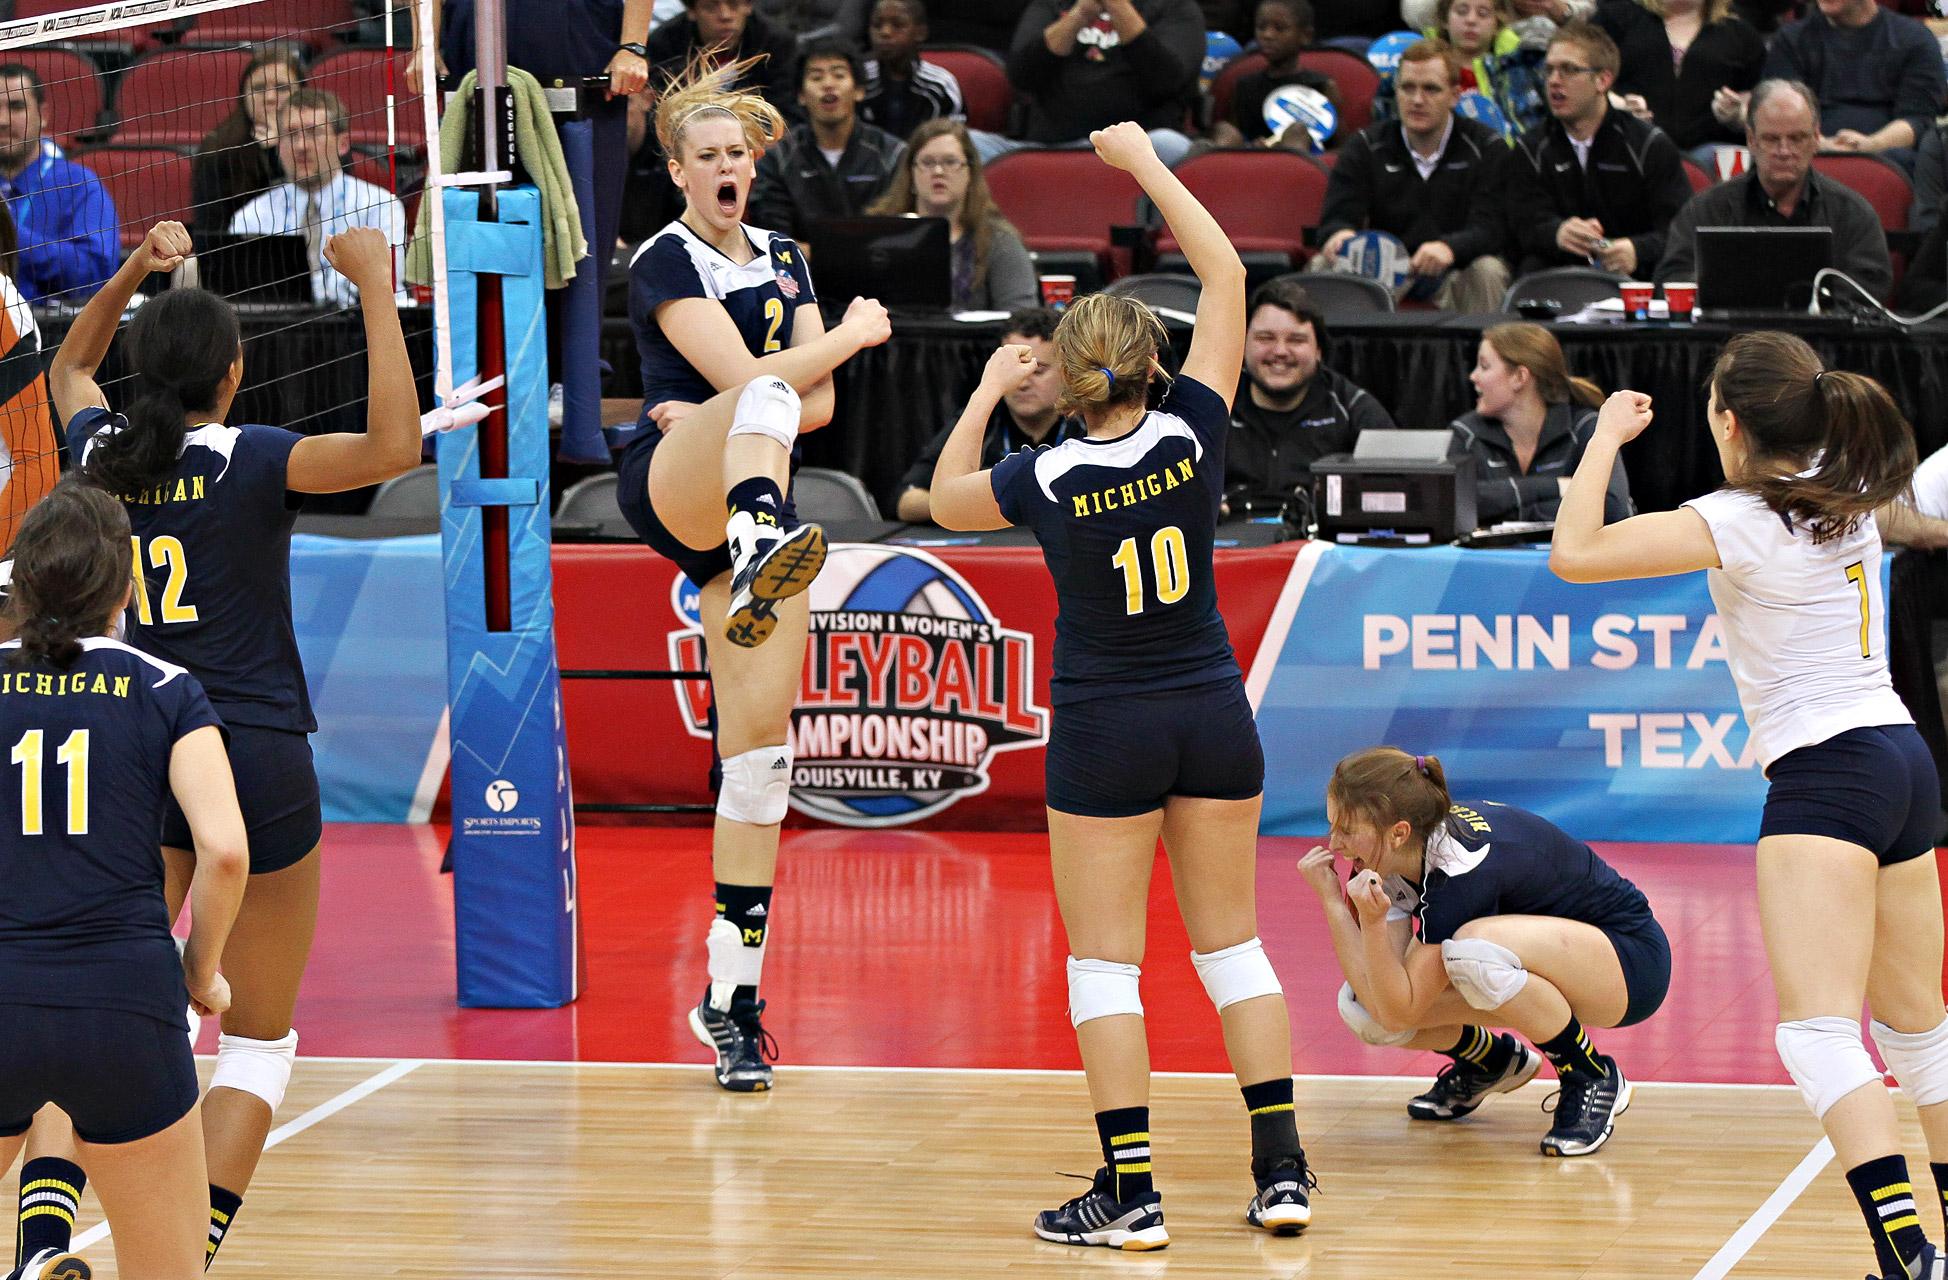 Michigan Volleyball